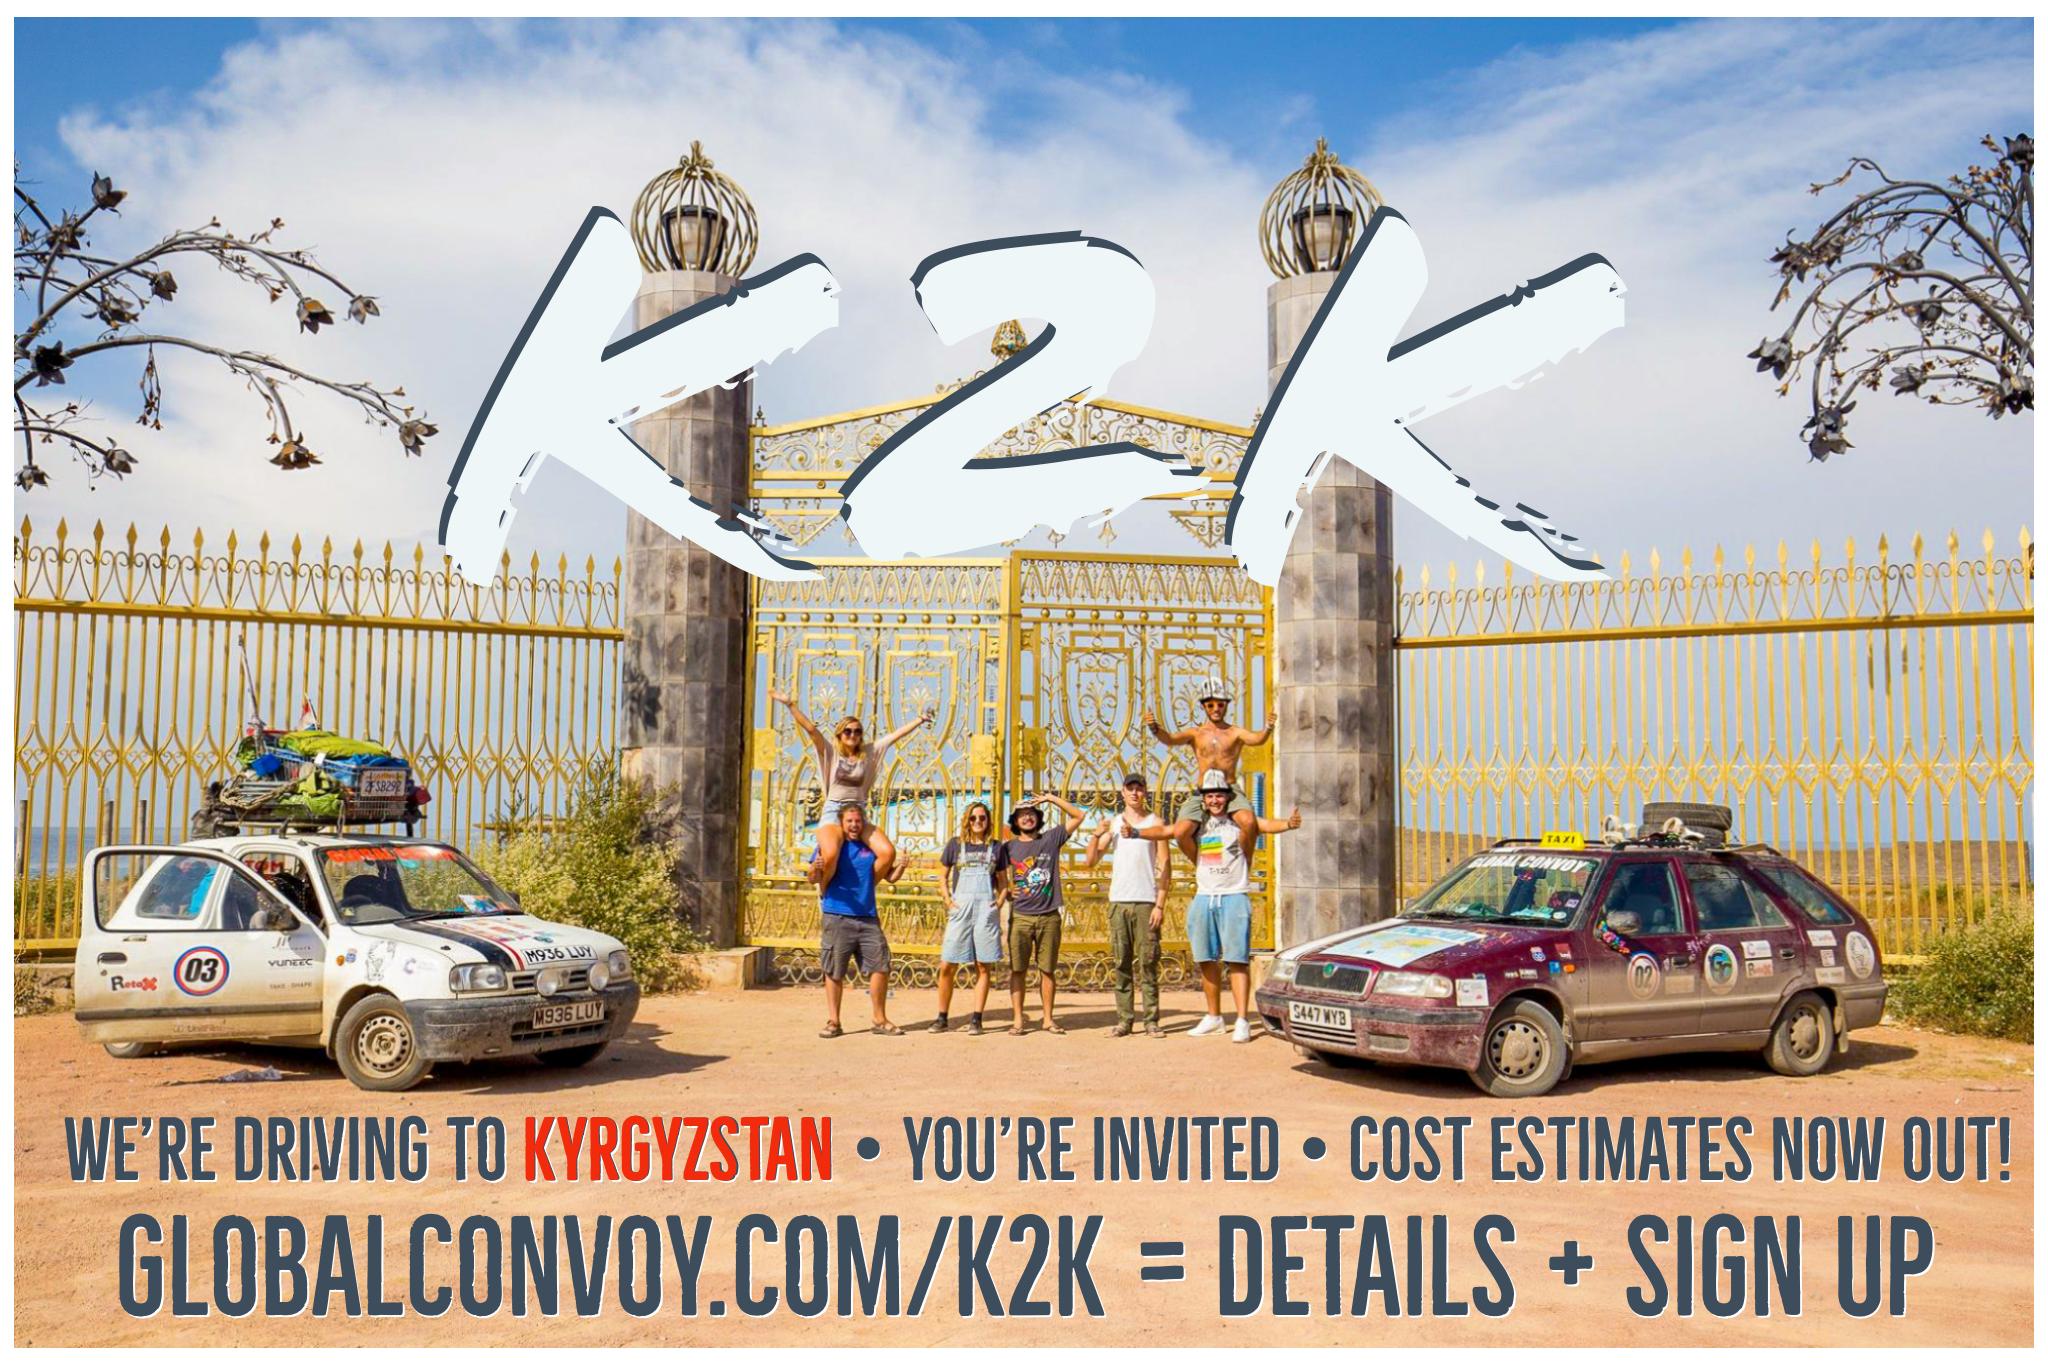 THE KONVOY TO KYRGYZSTAN - 7th August to 15th November, 2019Eurasia